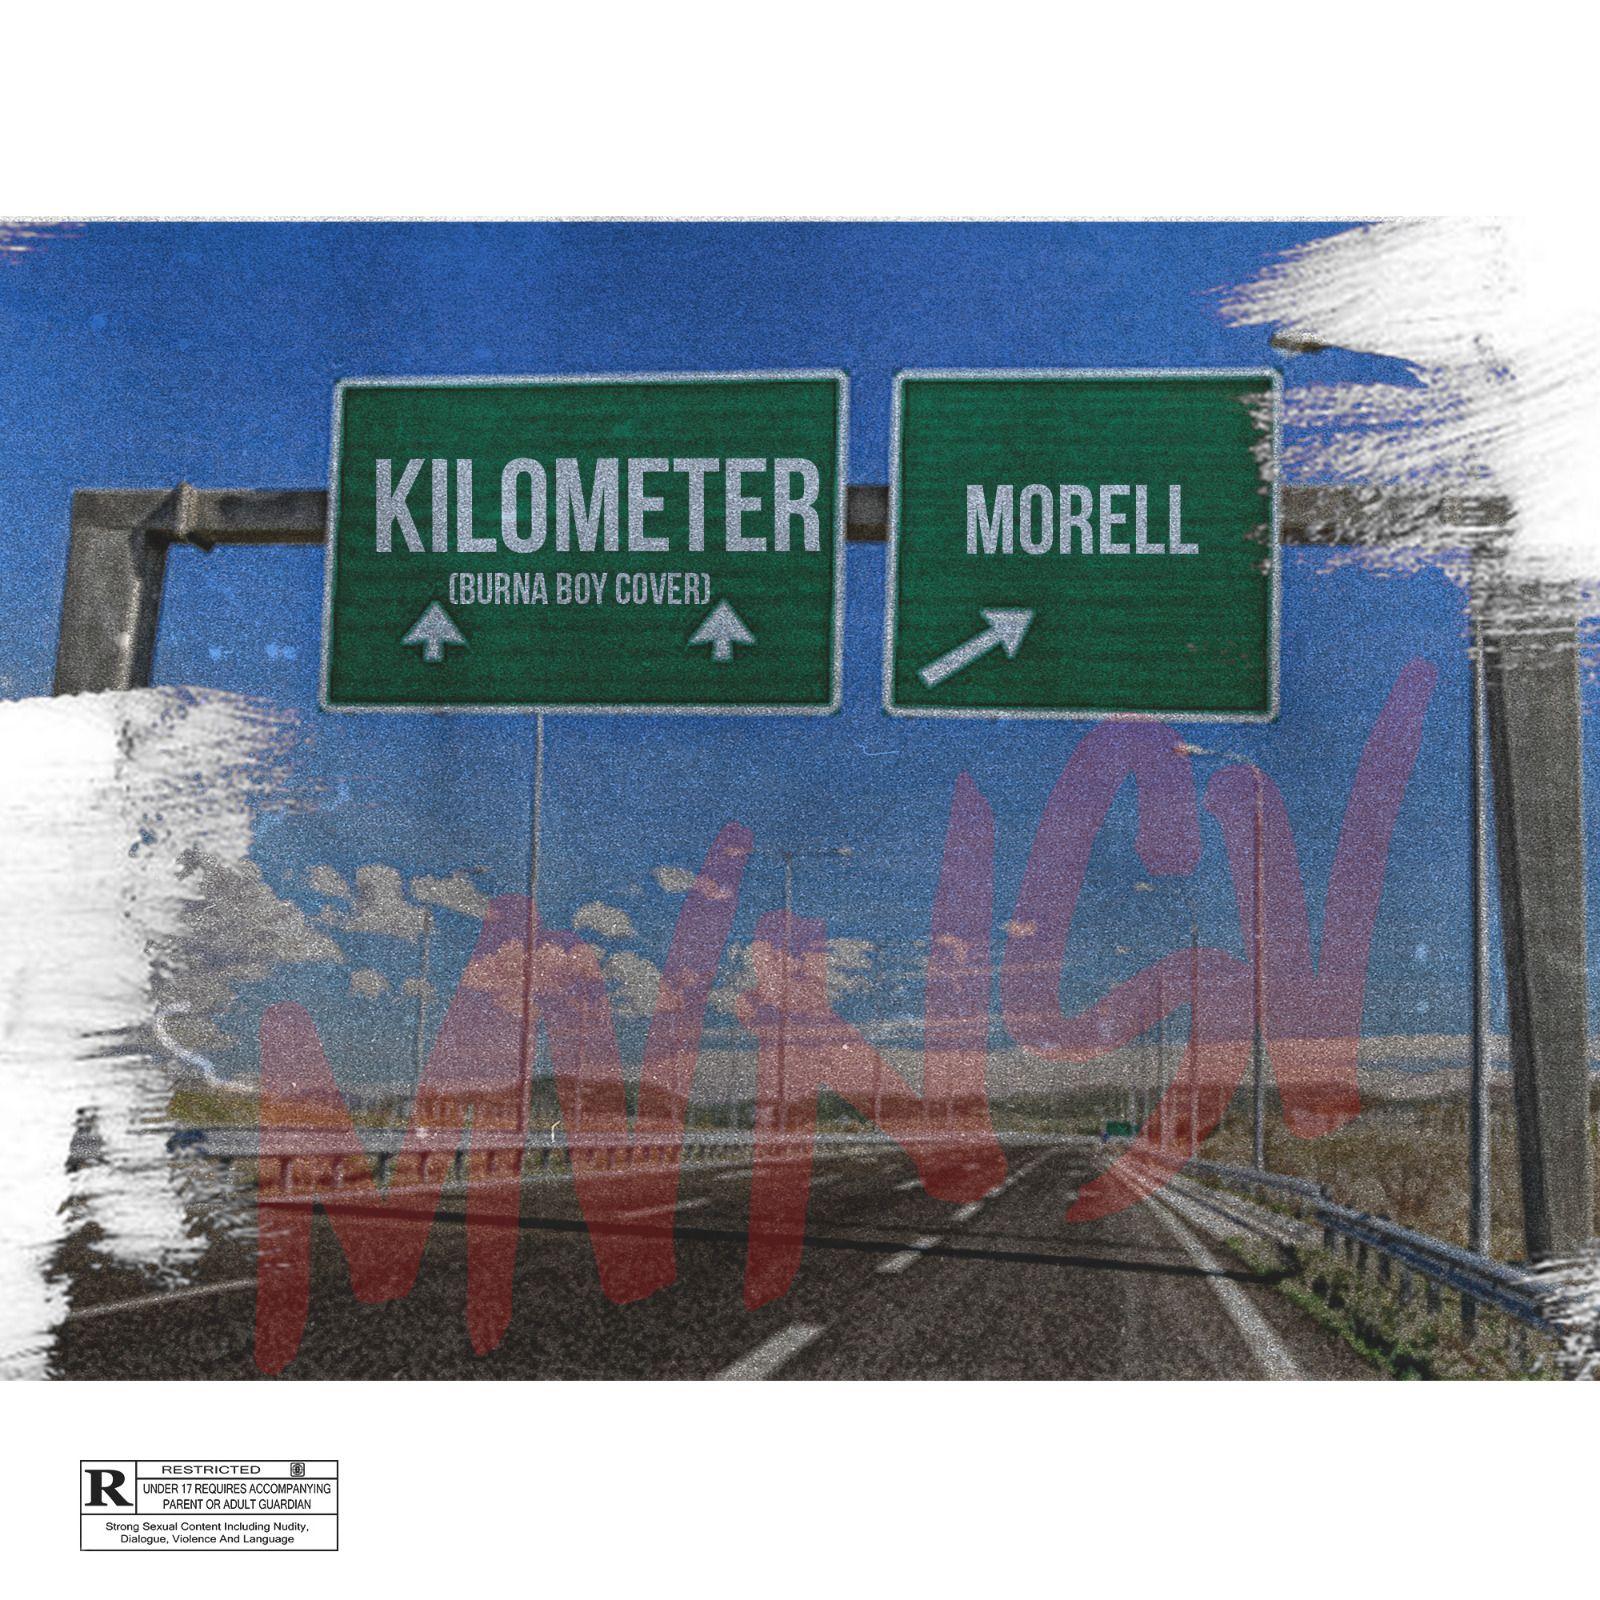 Morell – Kilometer (Burna Boy Cover) mp3 download